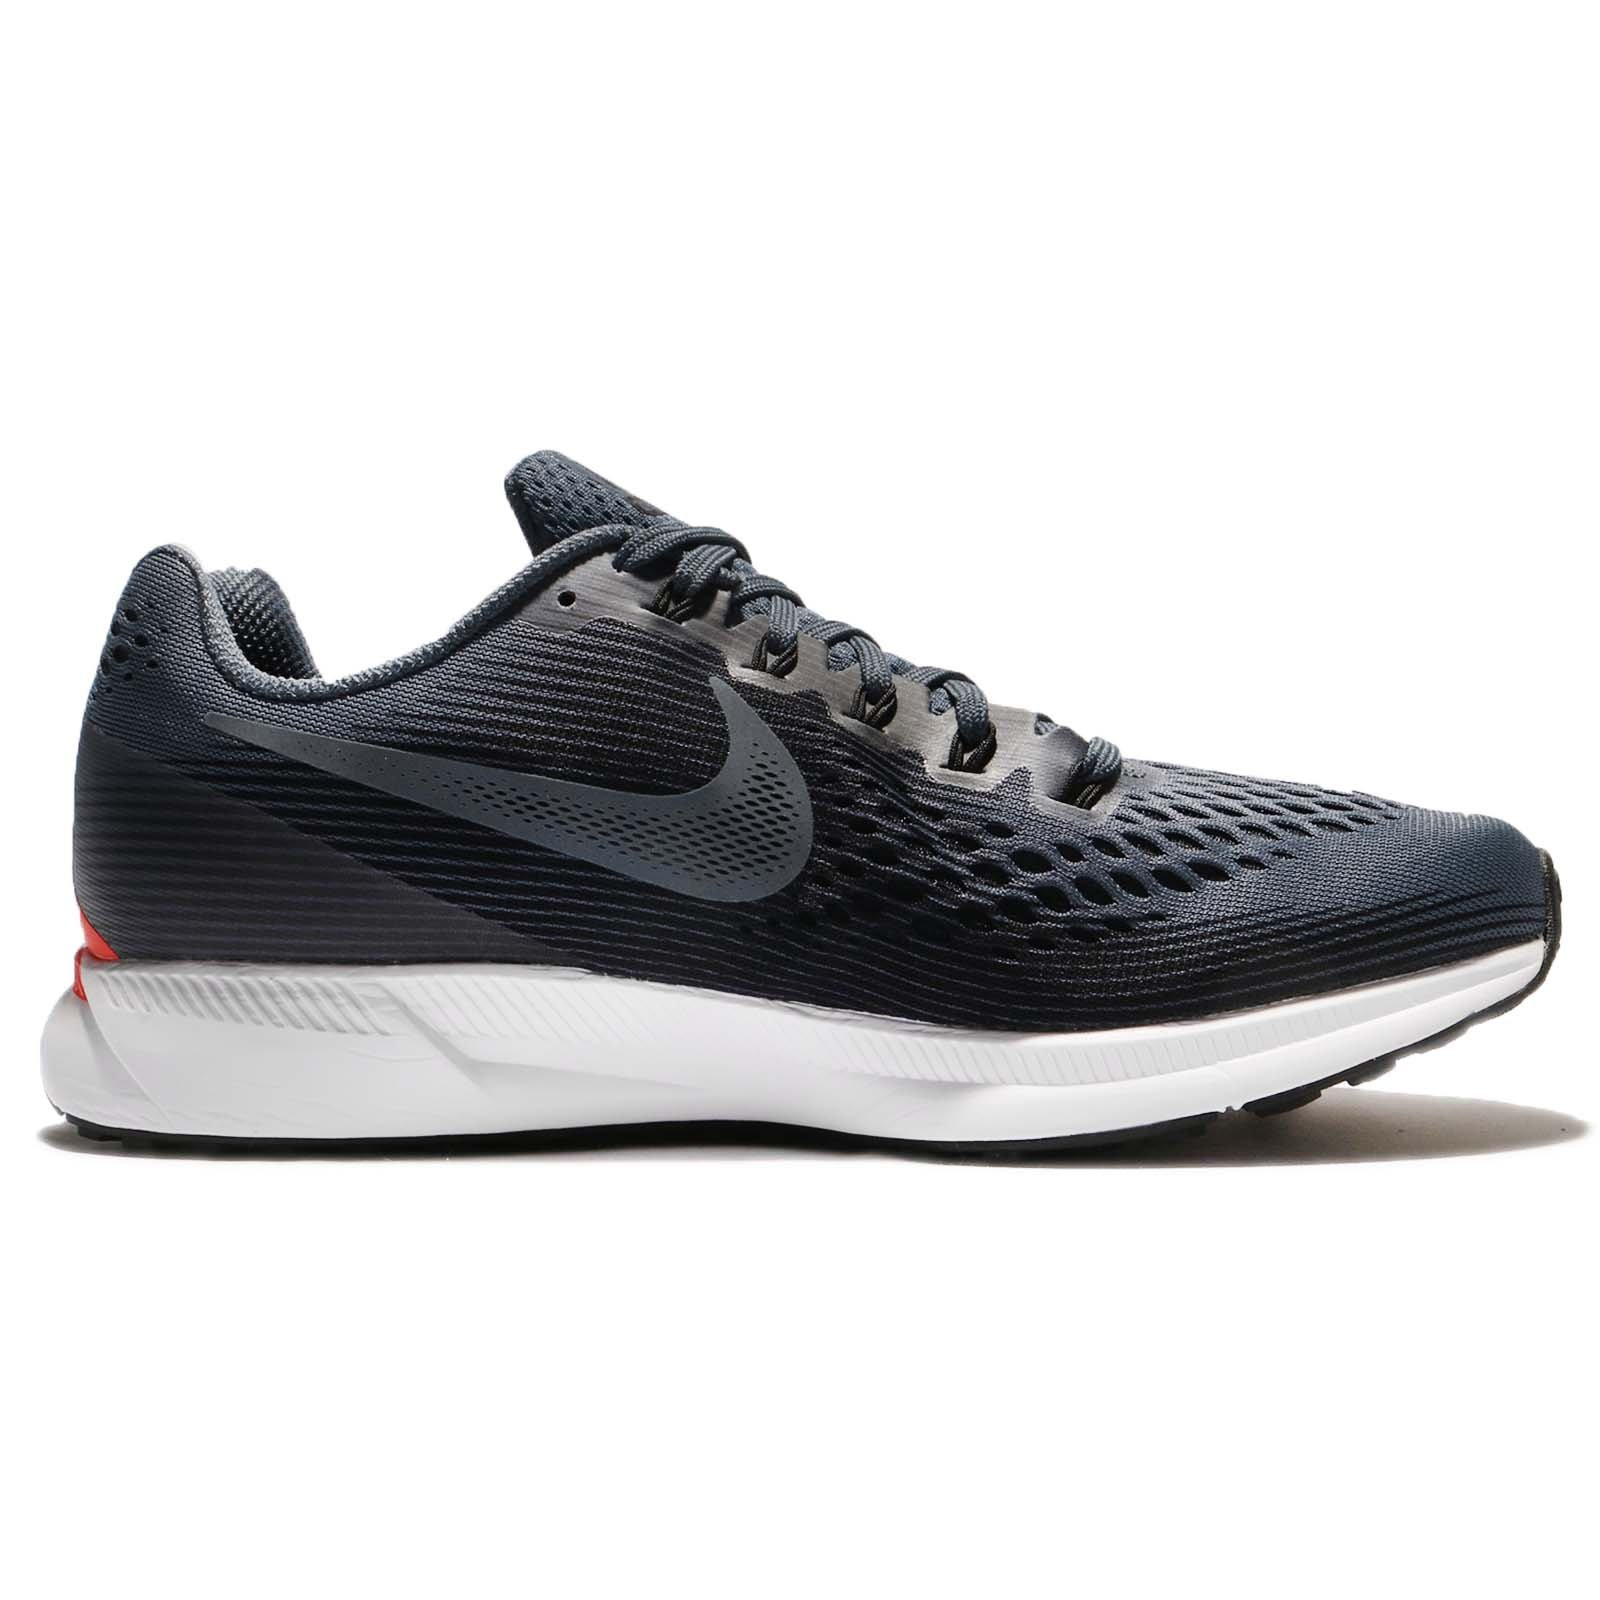 Nike Women's Air Zoom Pegasus 34 Running Shoes-Blue Fox/Black-5 by Nike (Image #2)